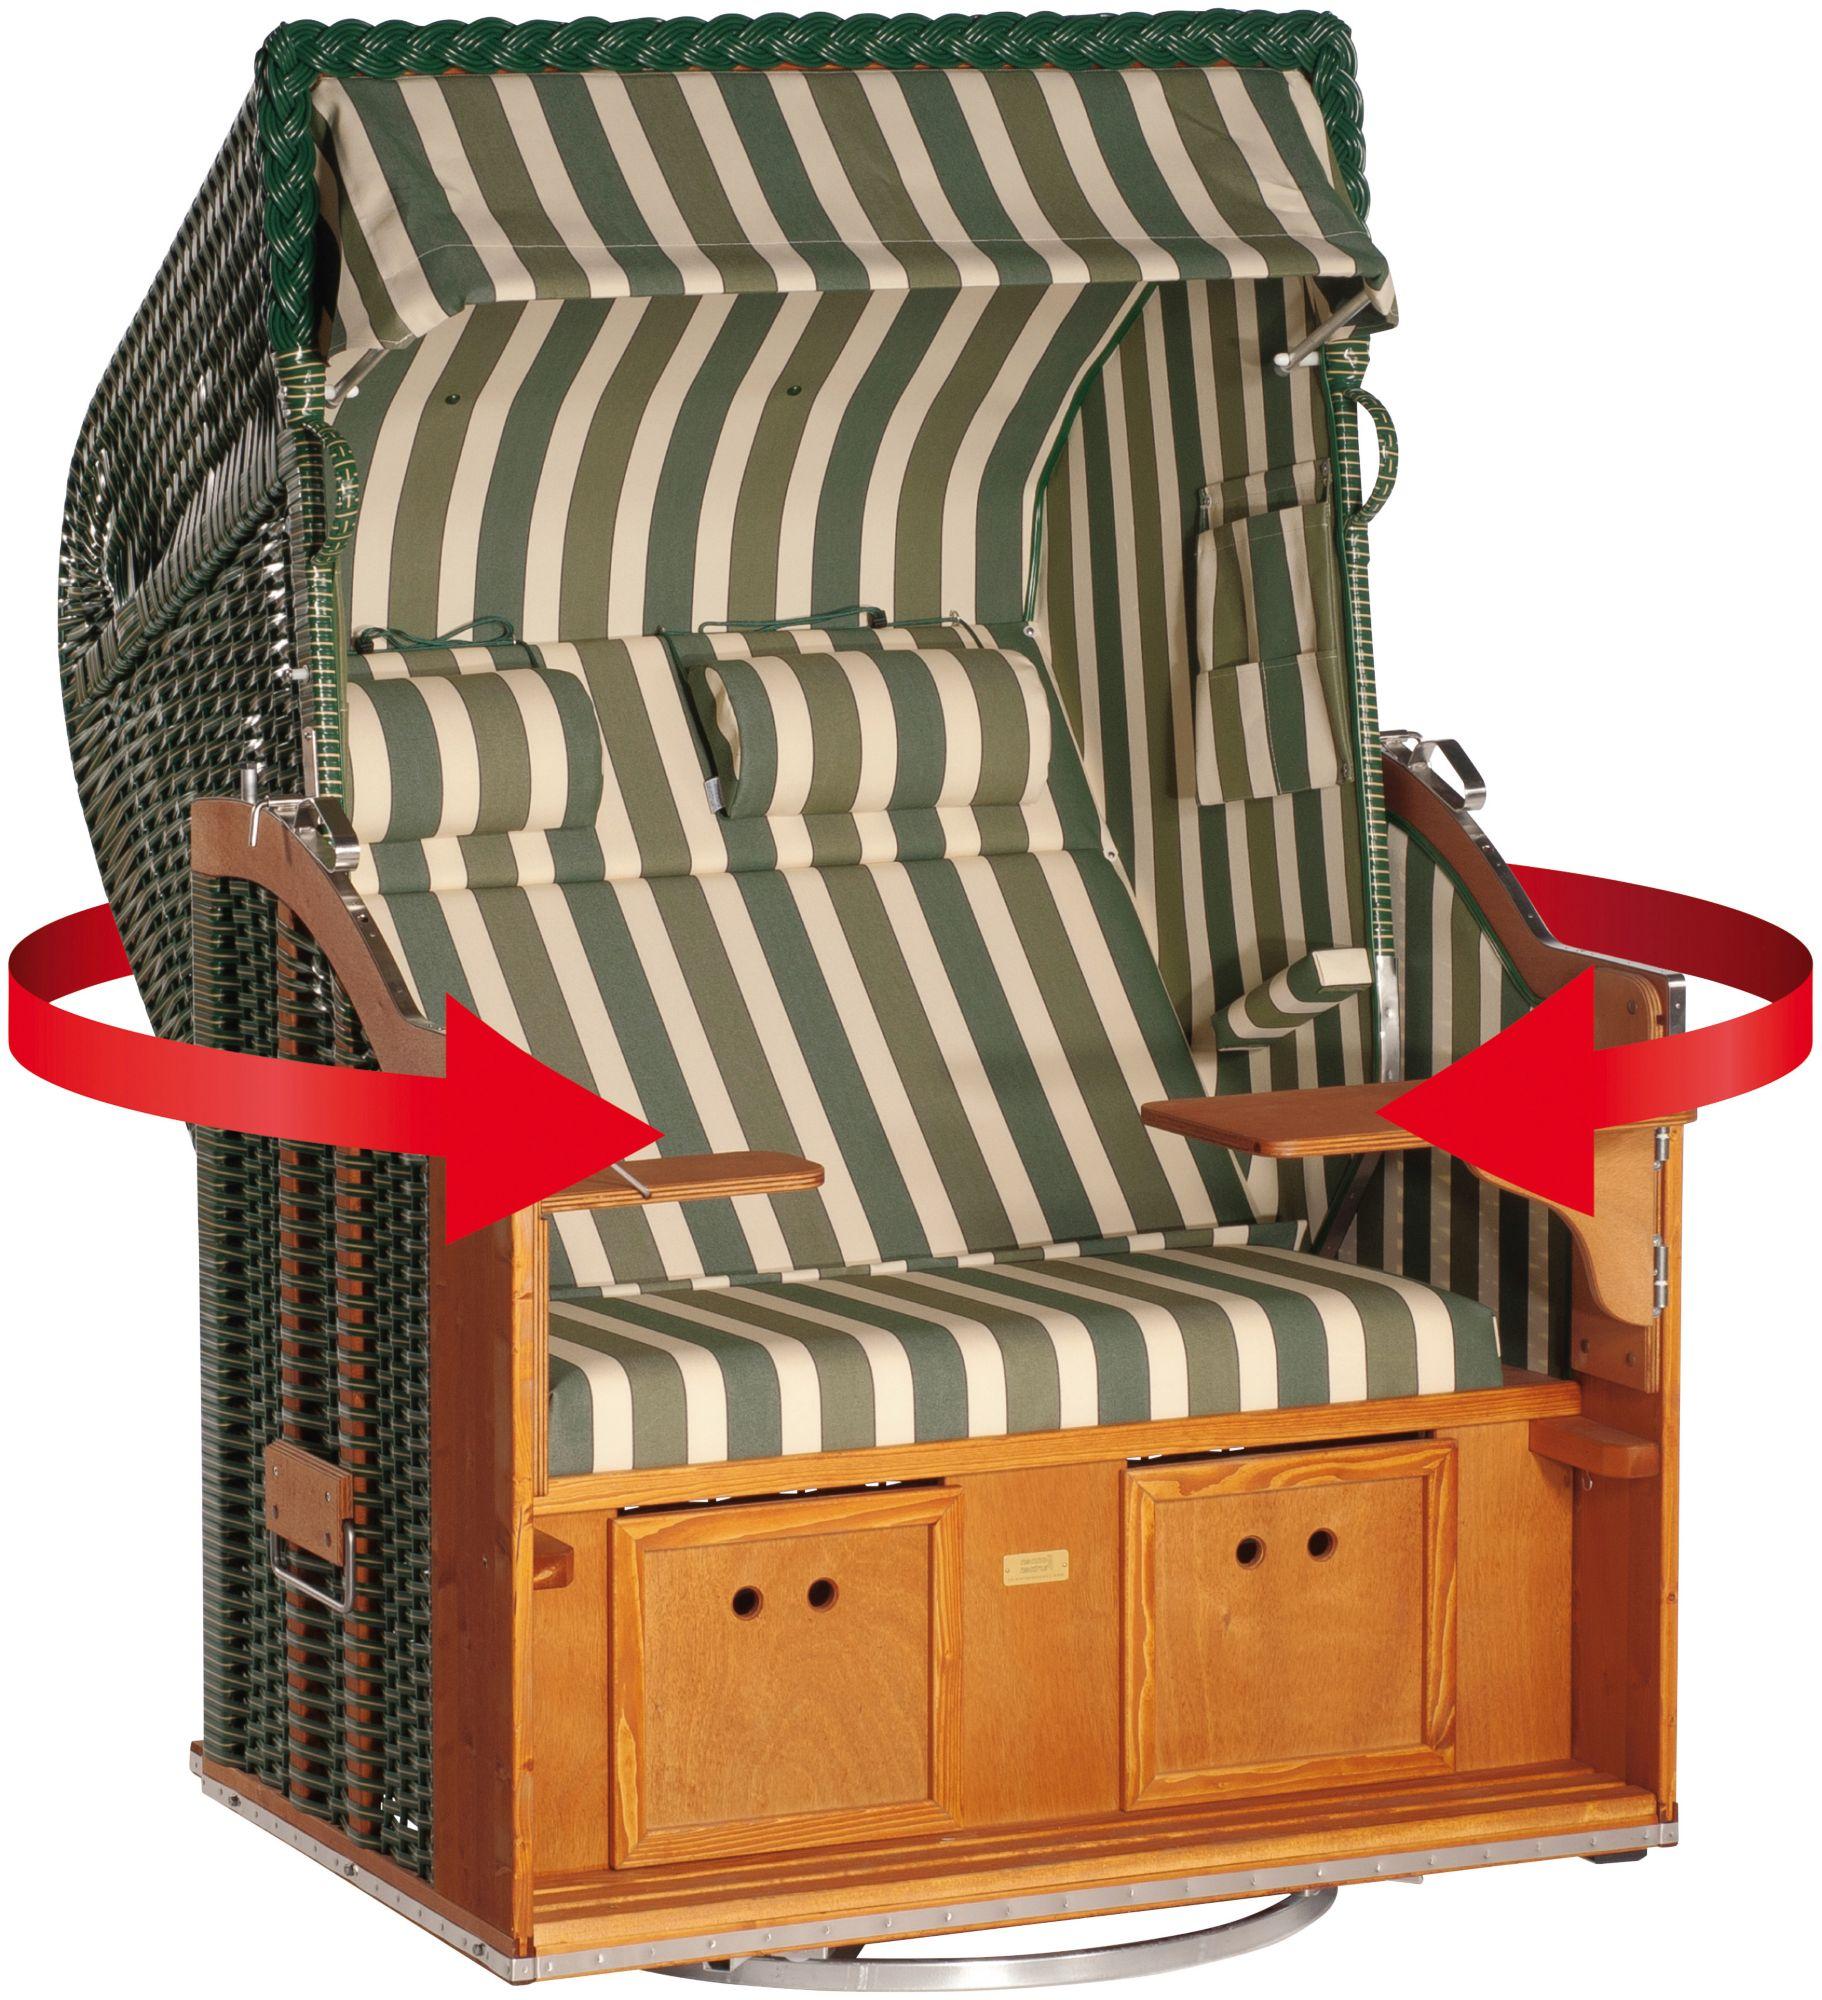 strandk rbe im schwab online shop baumarkt gartenm bel. Black Bedroom Furniture Sets. Home Design Ideas